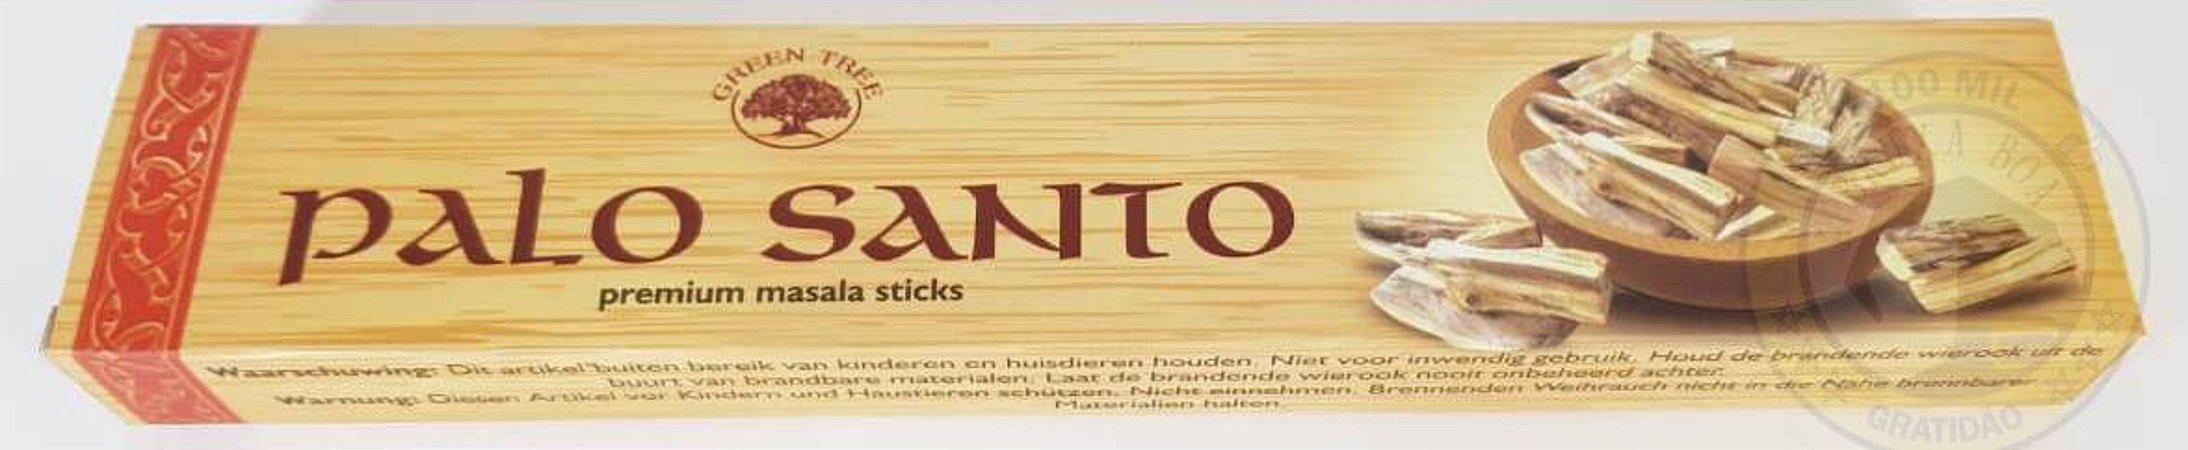 Incenso Palo Santo - Primium Massala Sticks